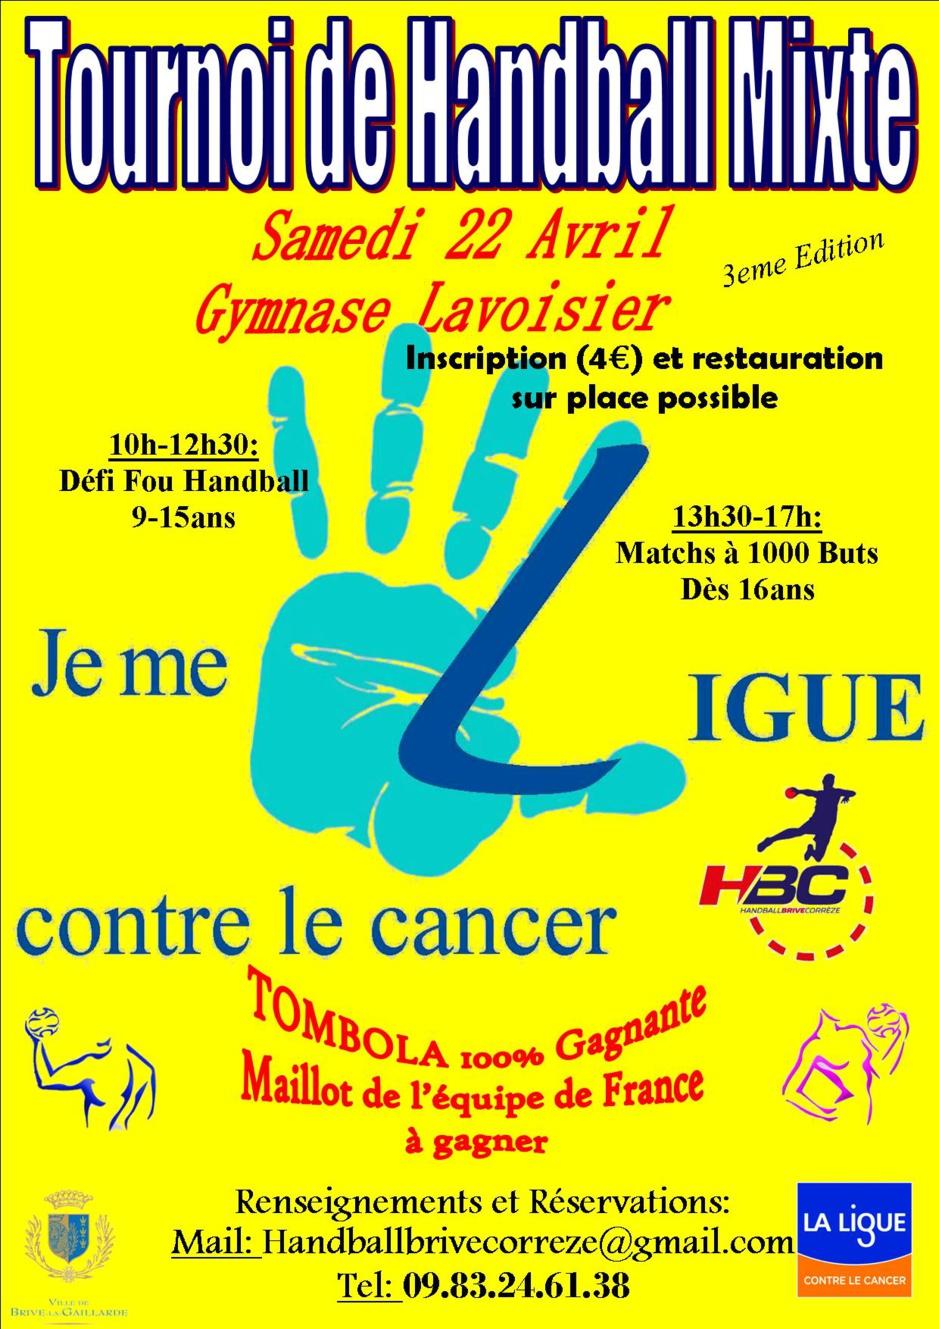 TOURNOI CONTRE LE CANCER 2017